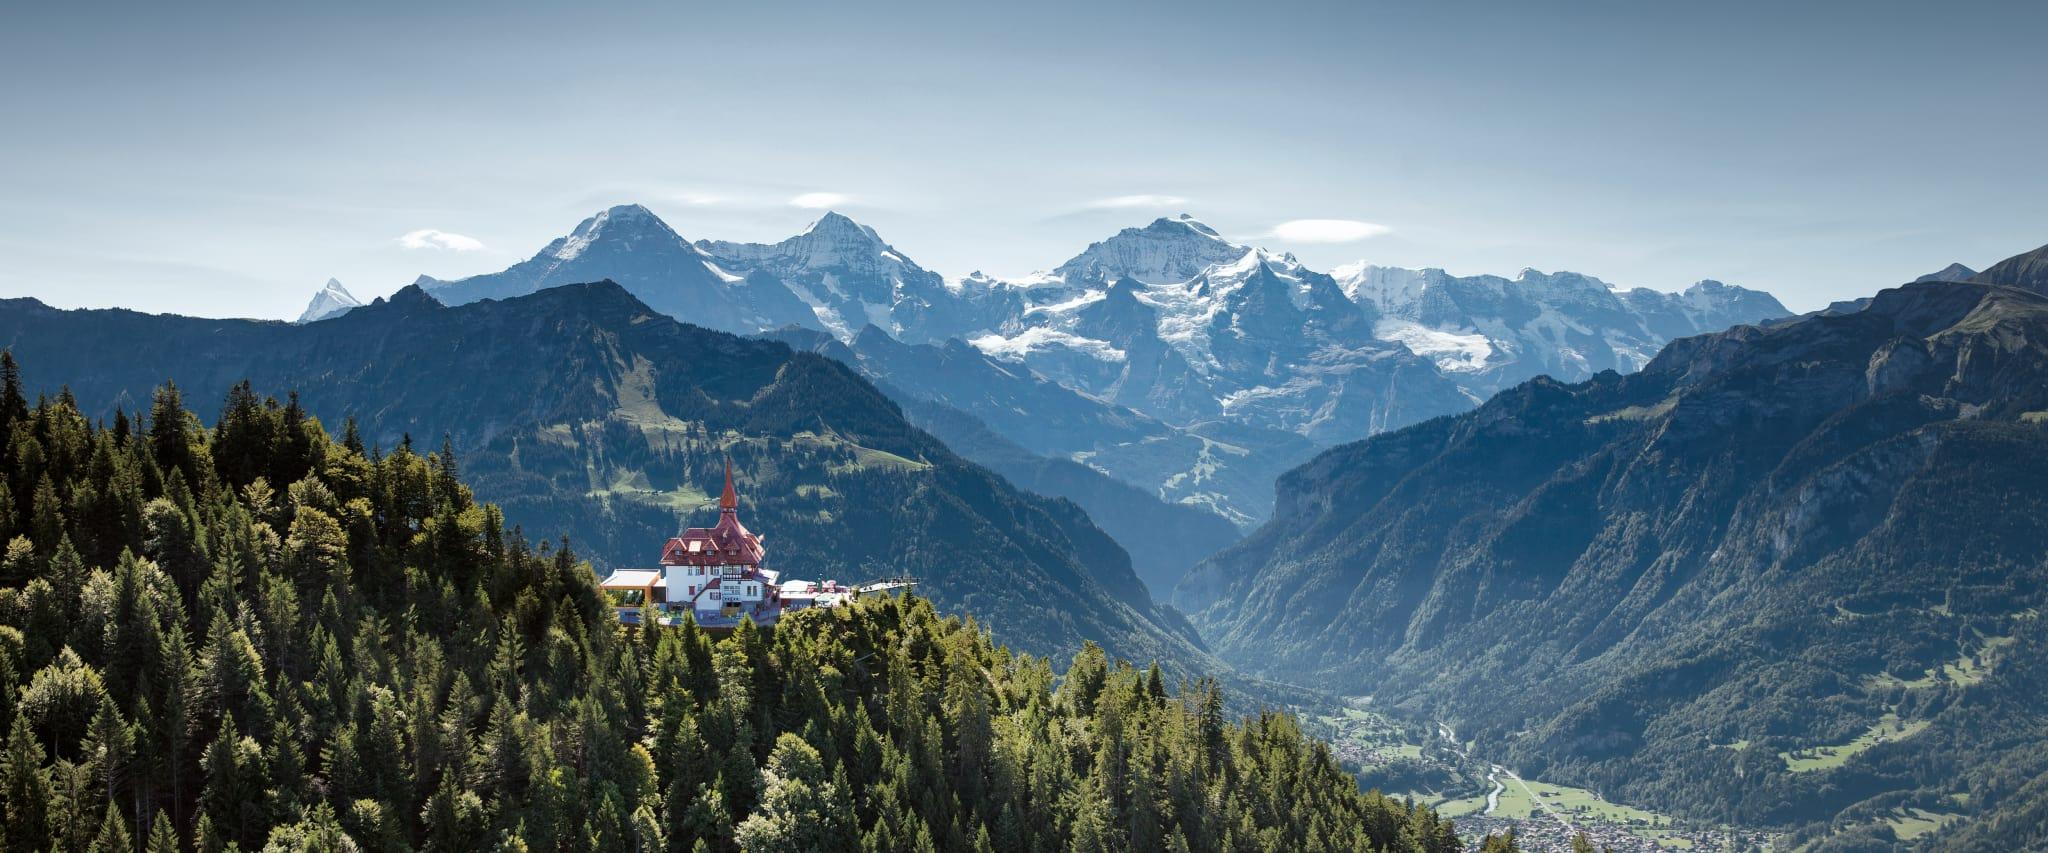 Aiger Monch Jungfrau Outline Sketch Vector Art